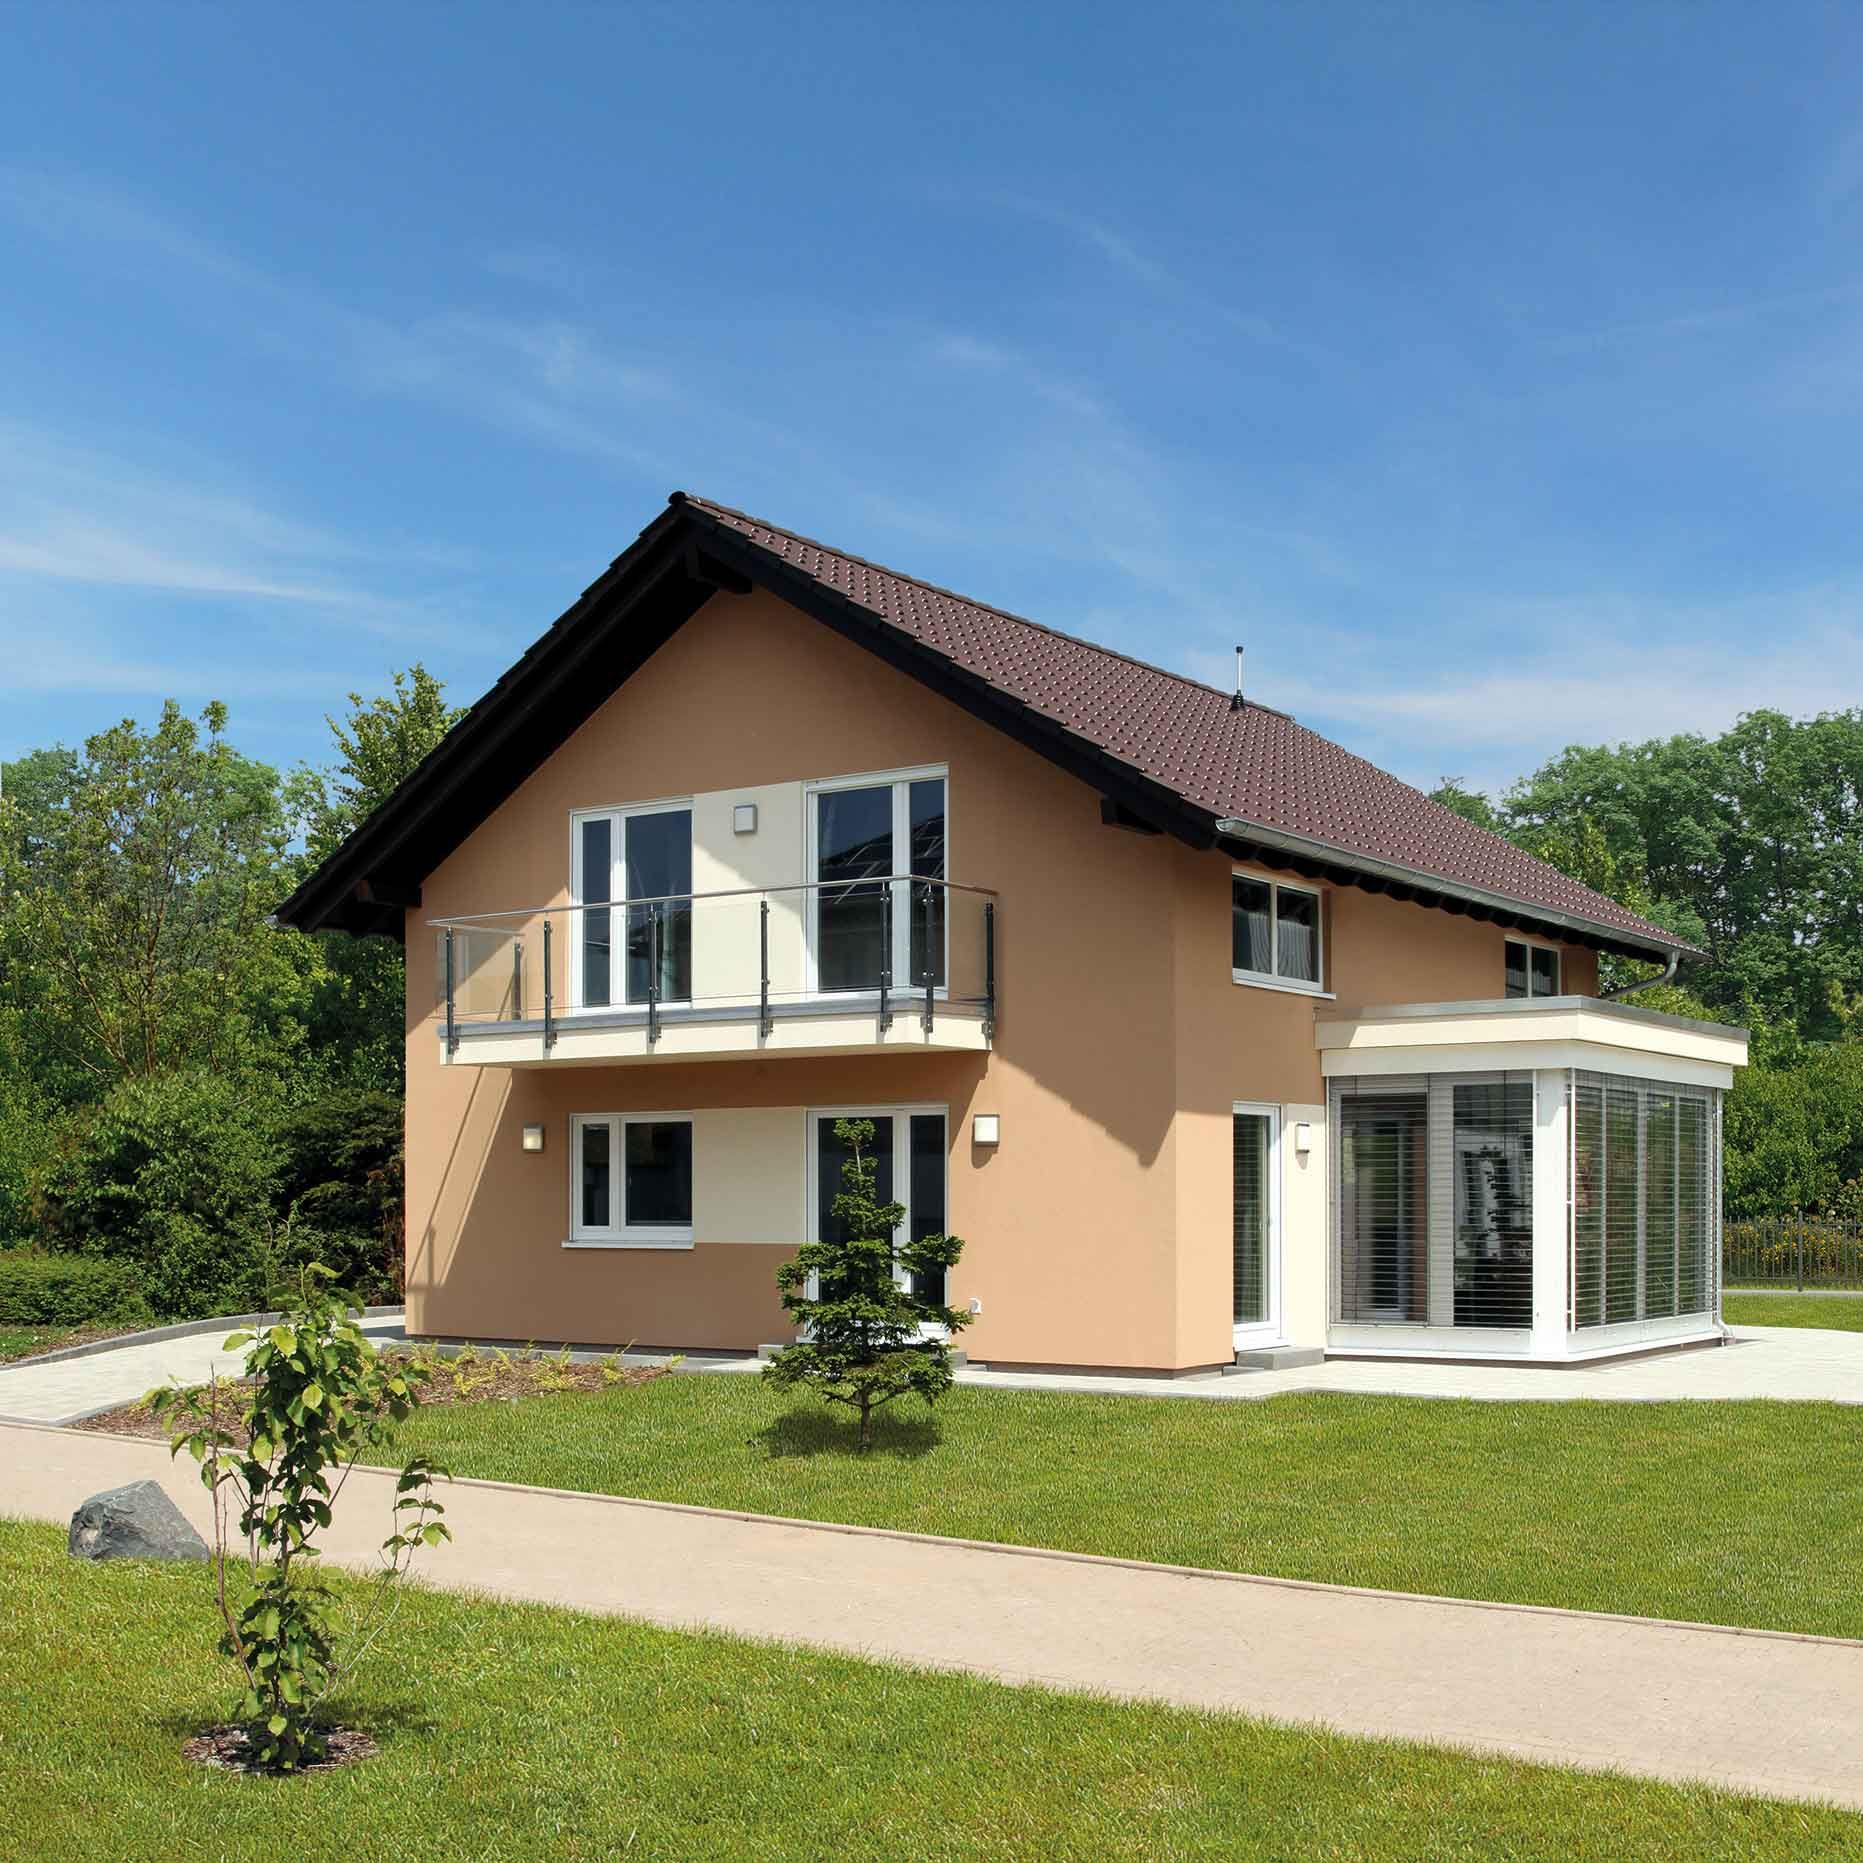 FingerHaus GmbH musterhaus fertighaus immobilien eco